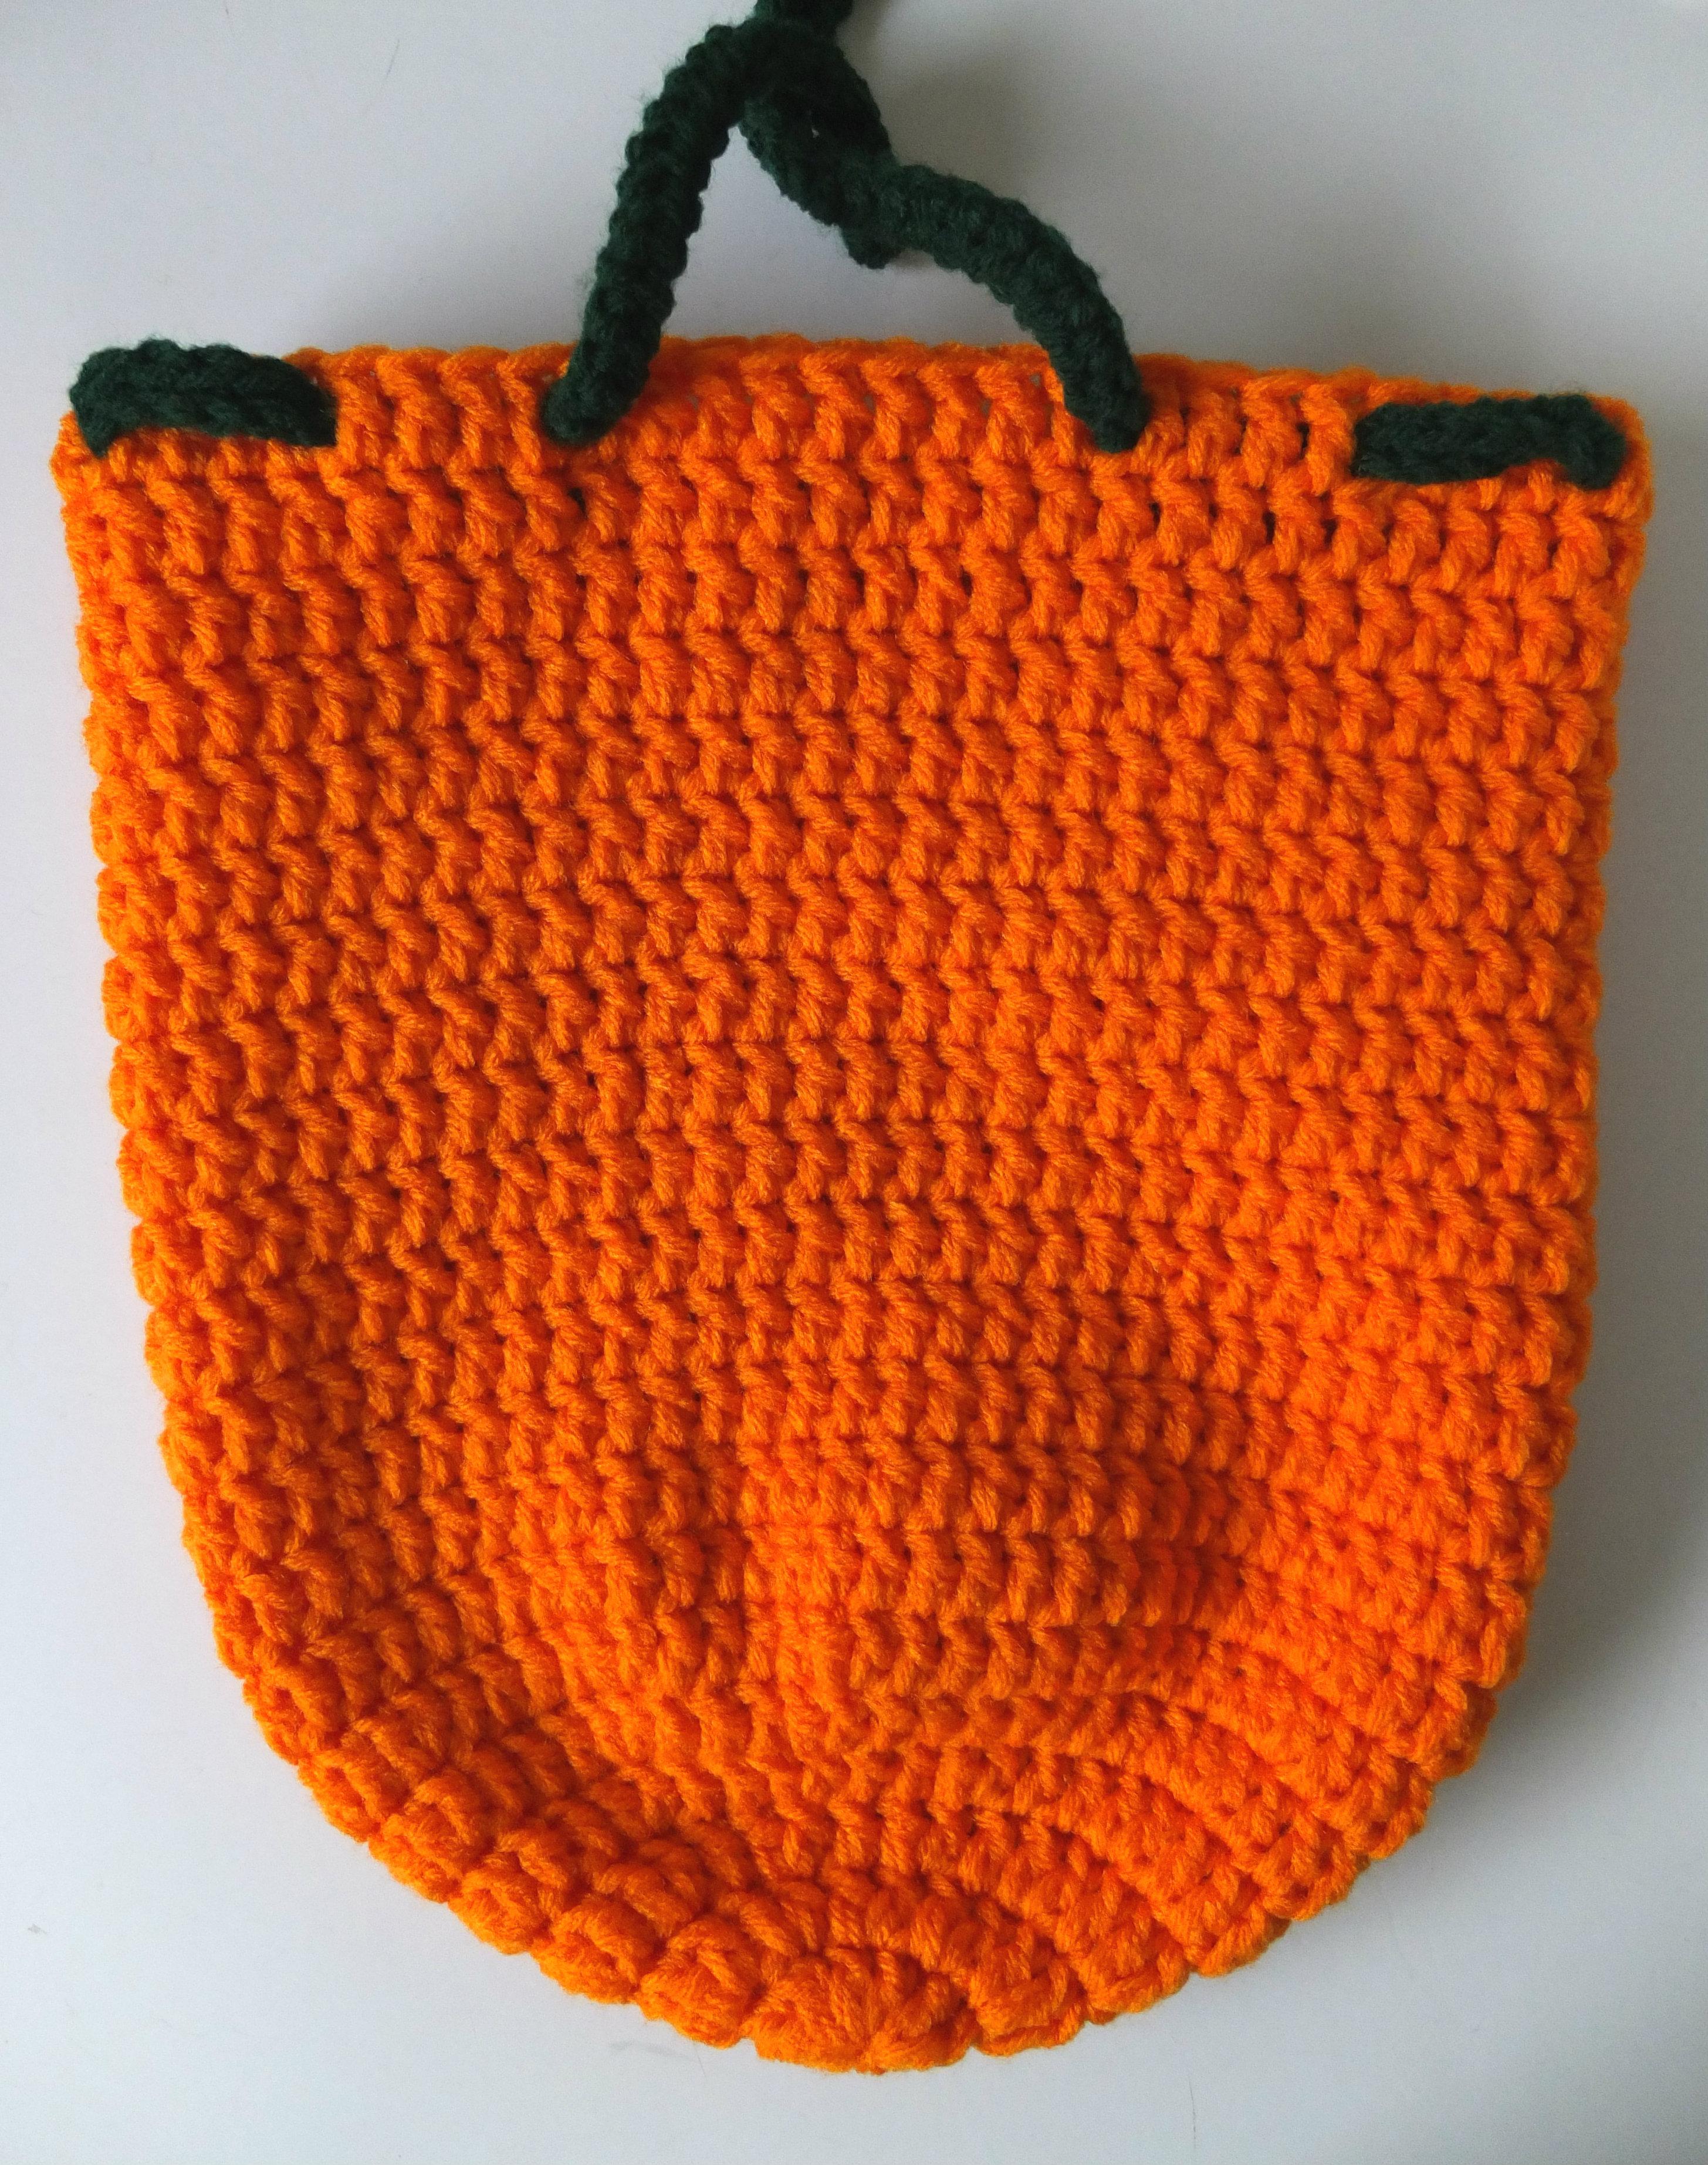 Pumpkin Drawstring Backpack